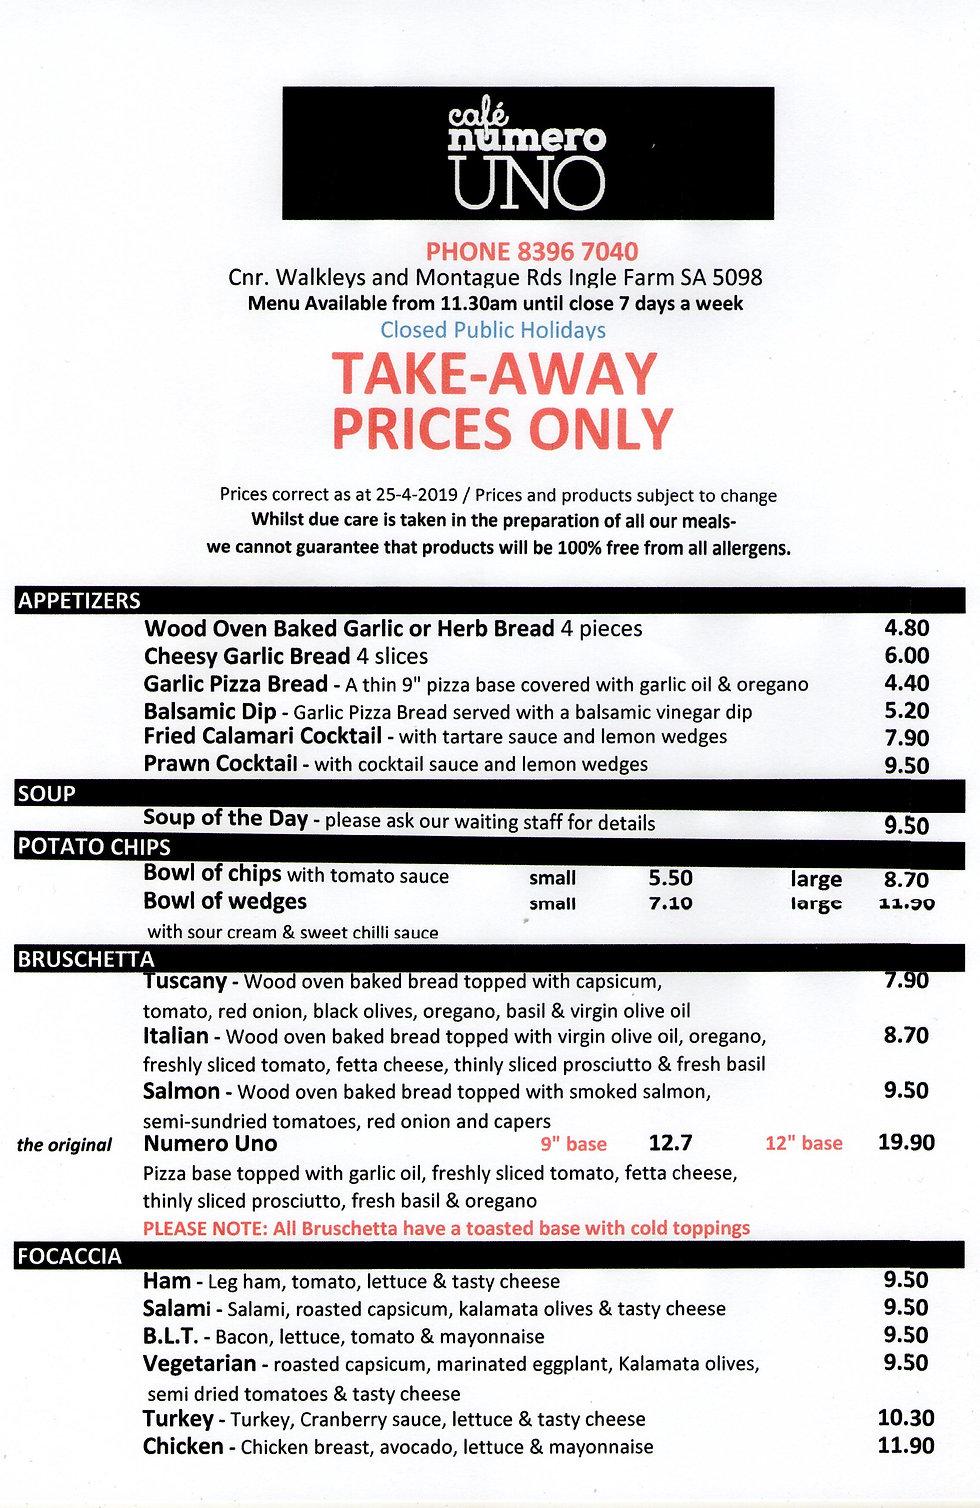 takeaway menu page 1 25-4-2019.jpg